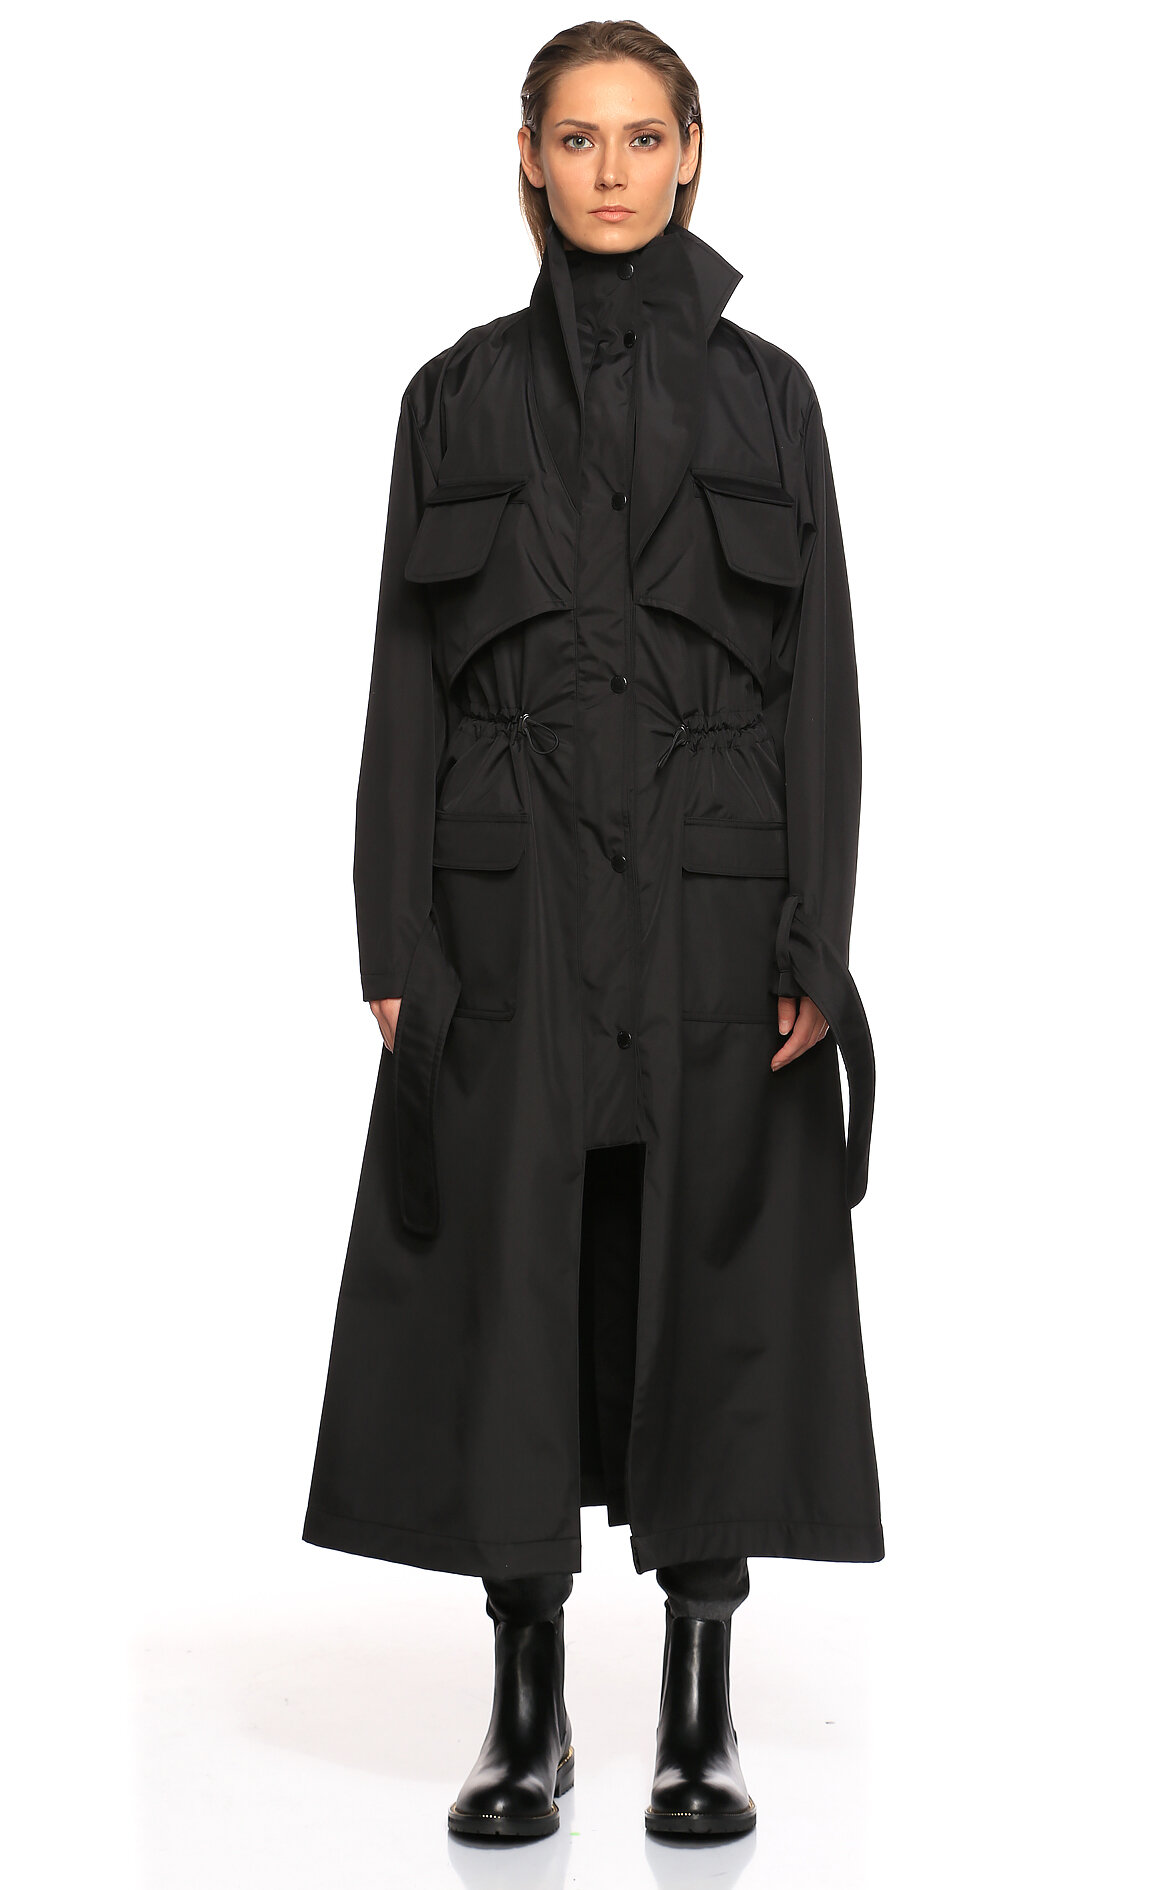 Coloreve-Coloreve Siyah Trençkot